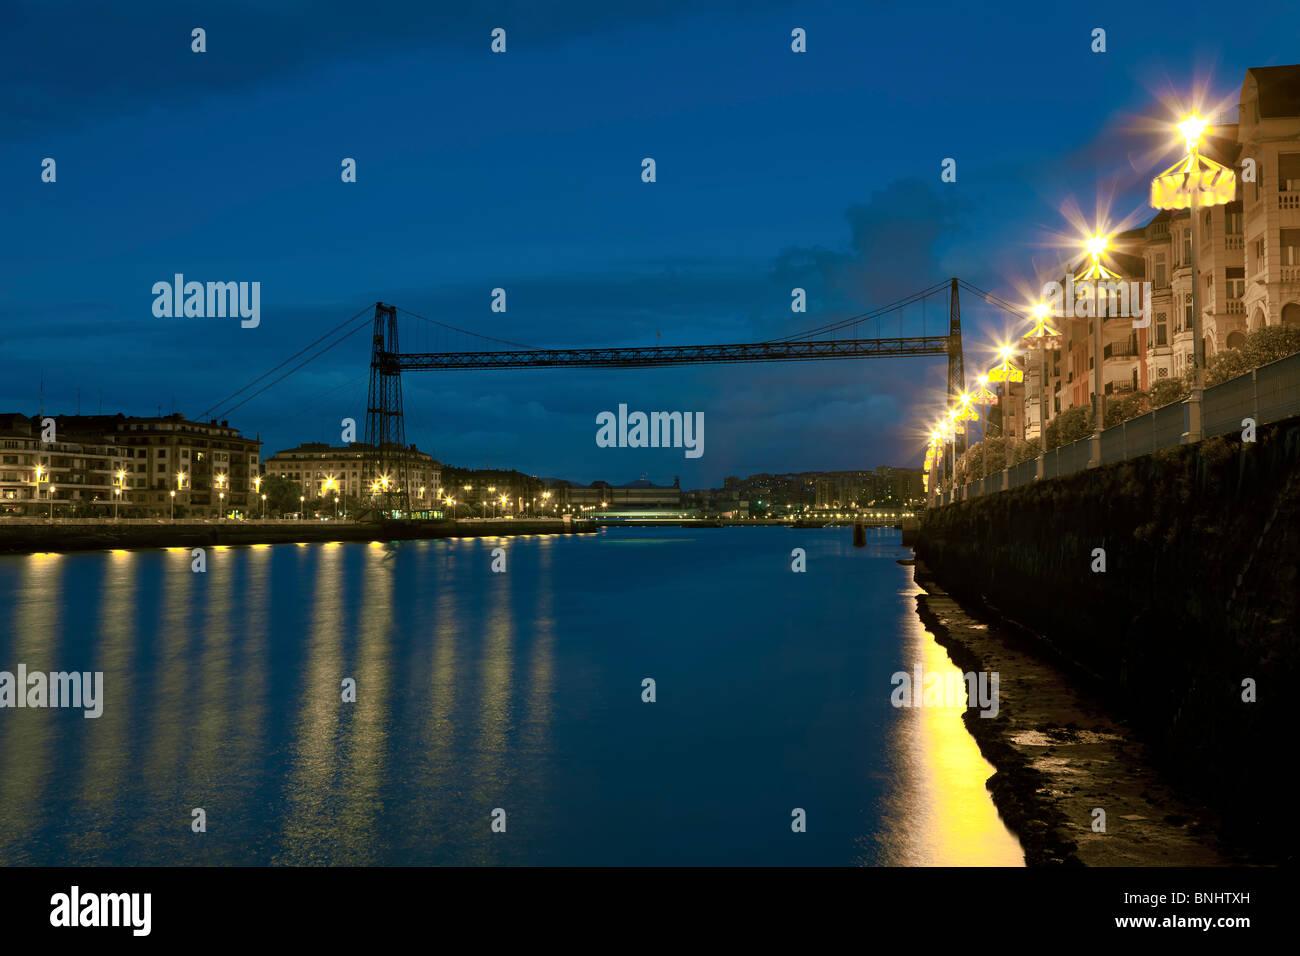 Suspension bridge, Portugalete, Bizkaia, Spain. - Stock Image